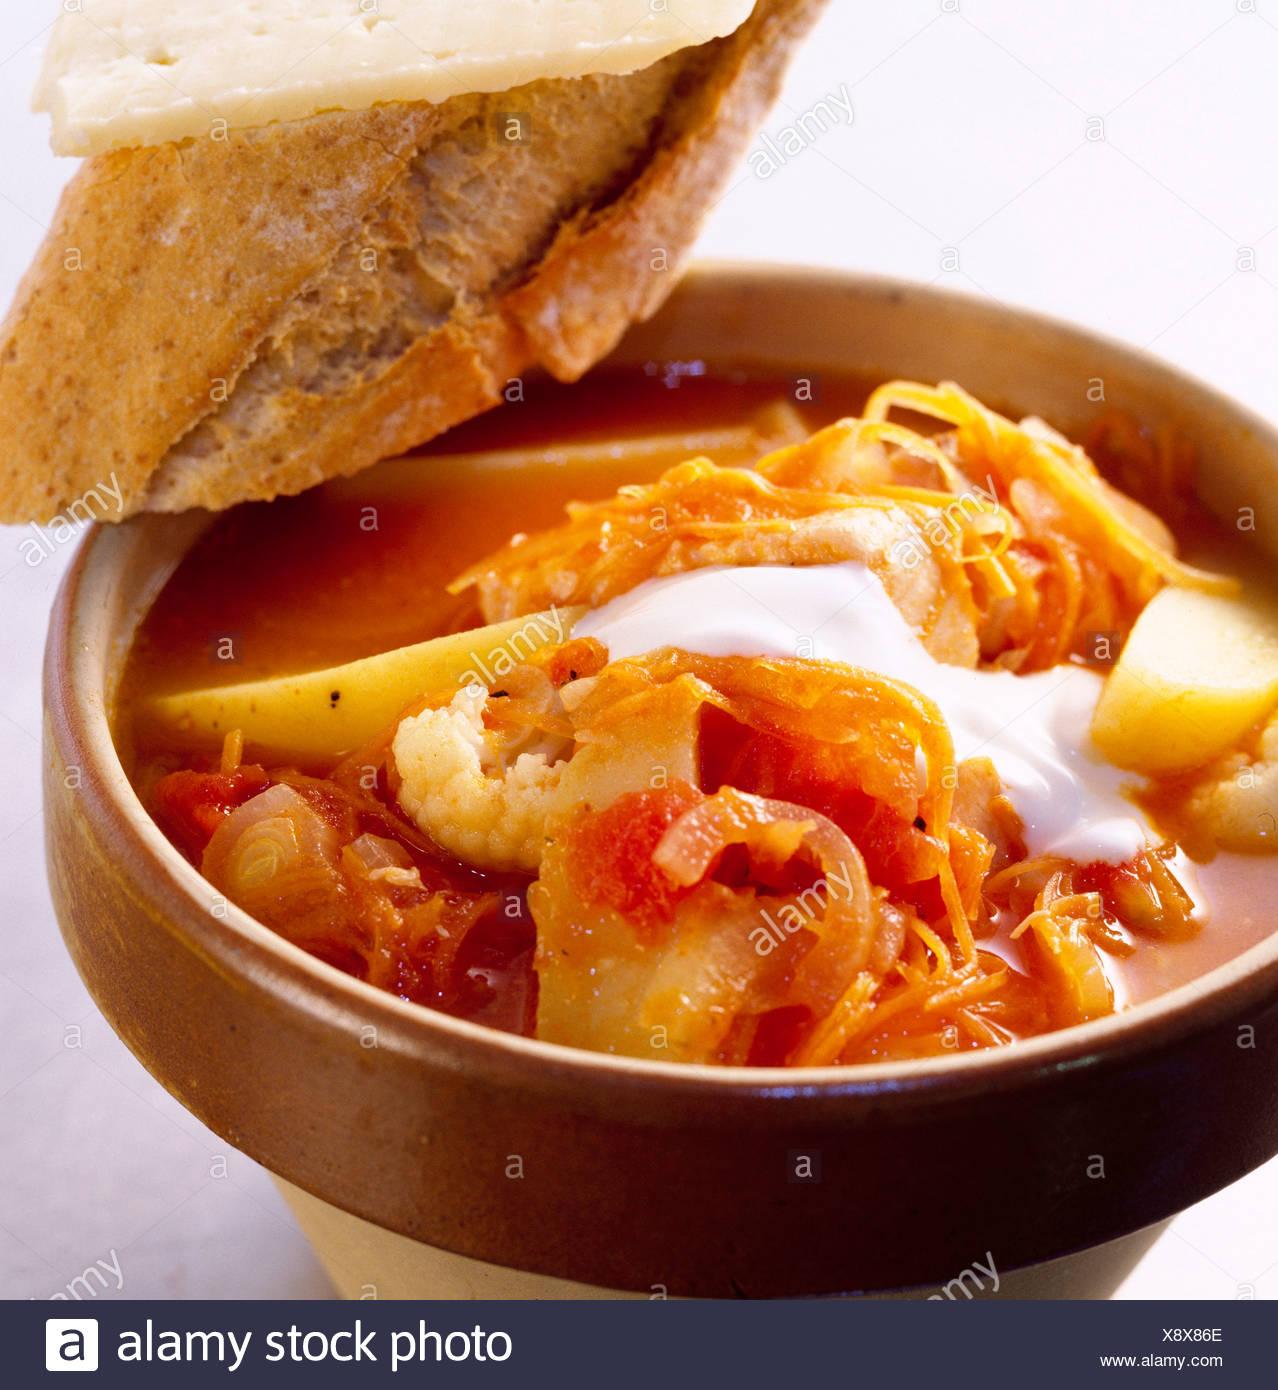 Midweek meals Fish casserole salmon, onion, carrots, tomatoes and potatoes yoghurt garnish in earthenware casserole dish chunk - Stock Image